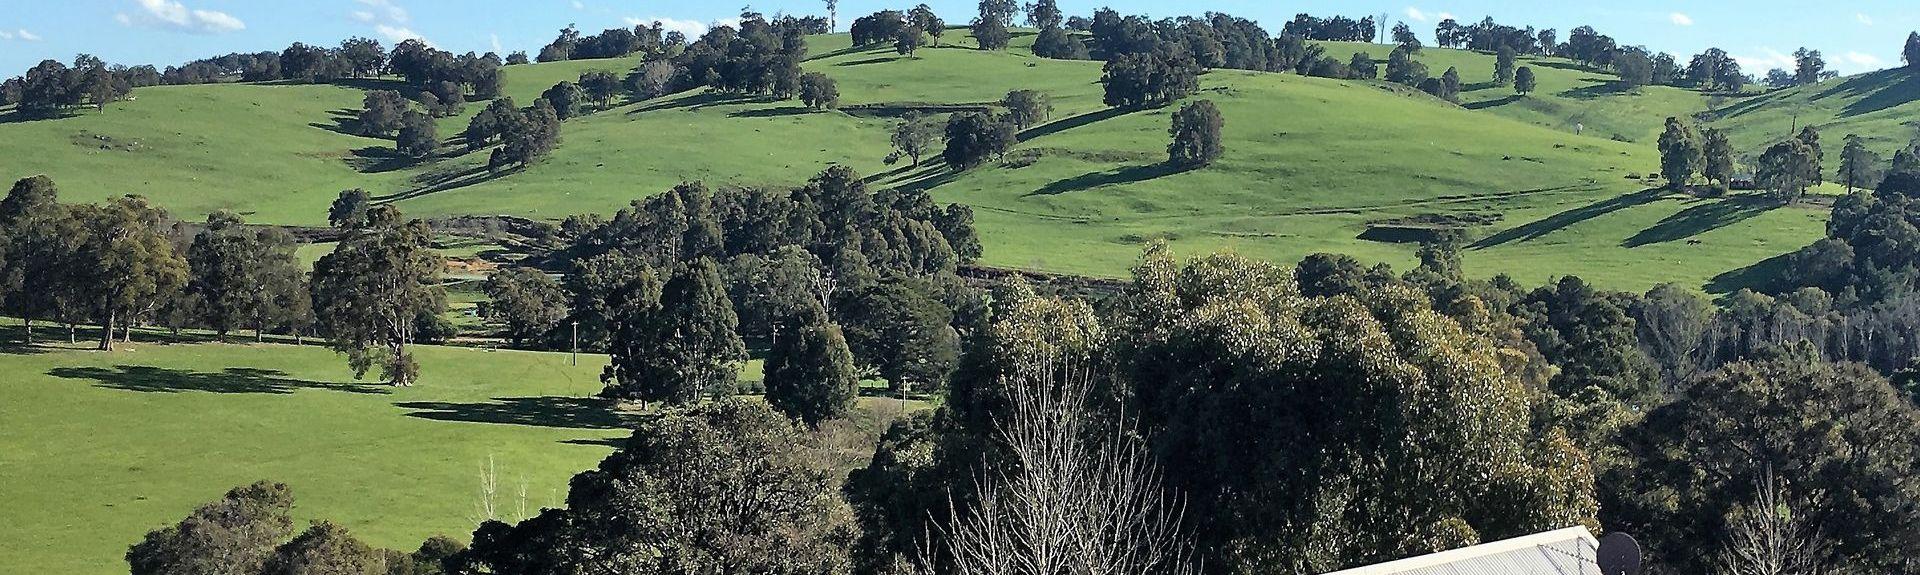 Balingup Lavender Farm, Balingup, Australie-Occidentale, Australie